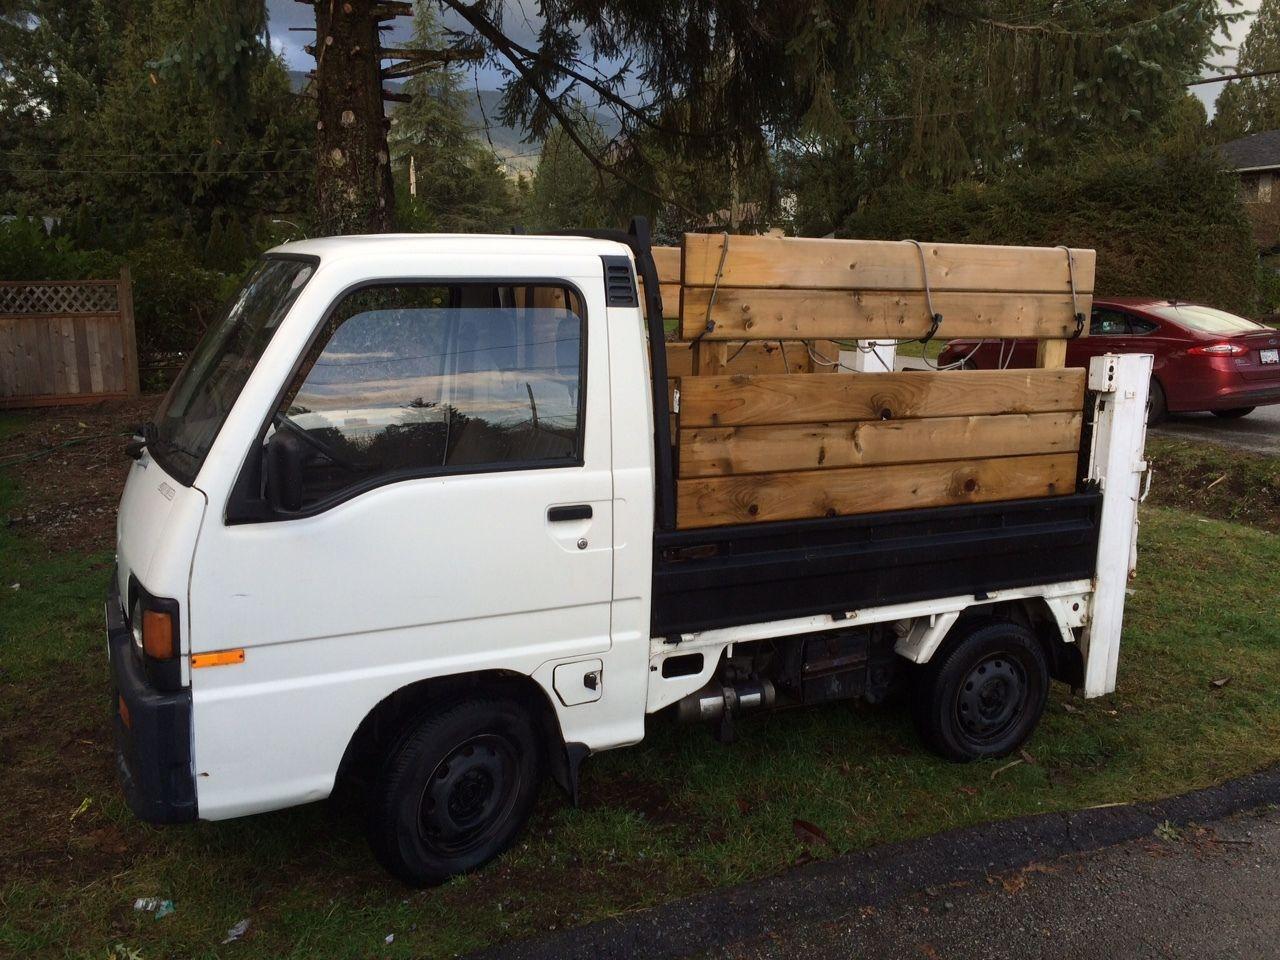 1991 Subaru Sambar Mini Pickup With Power Lift Gate And